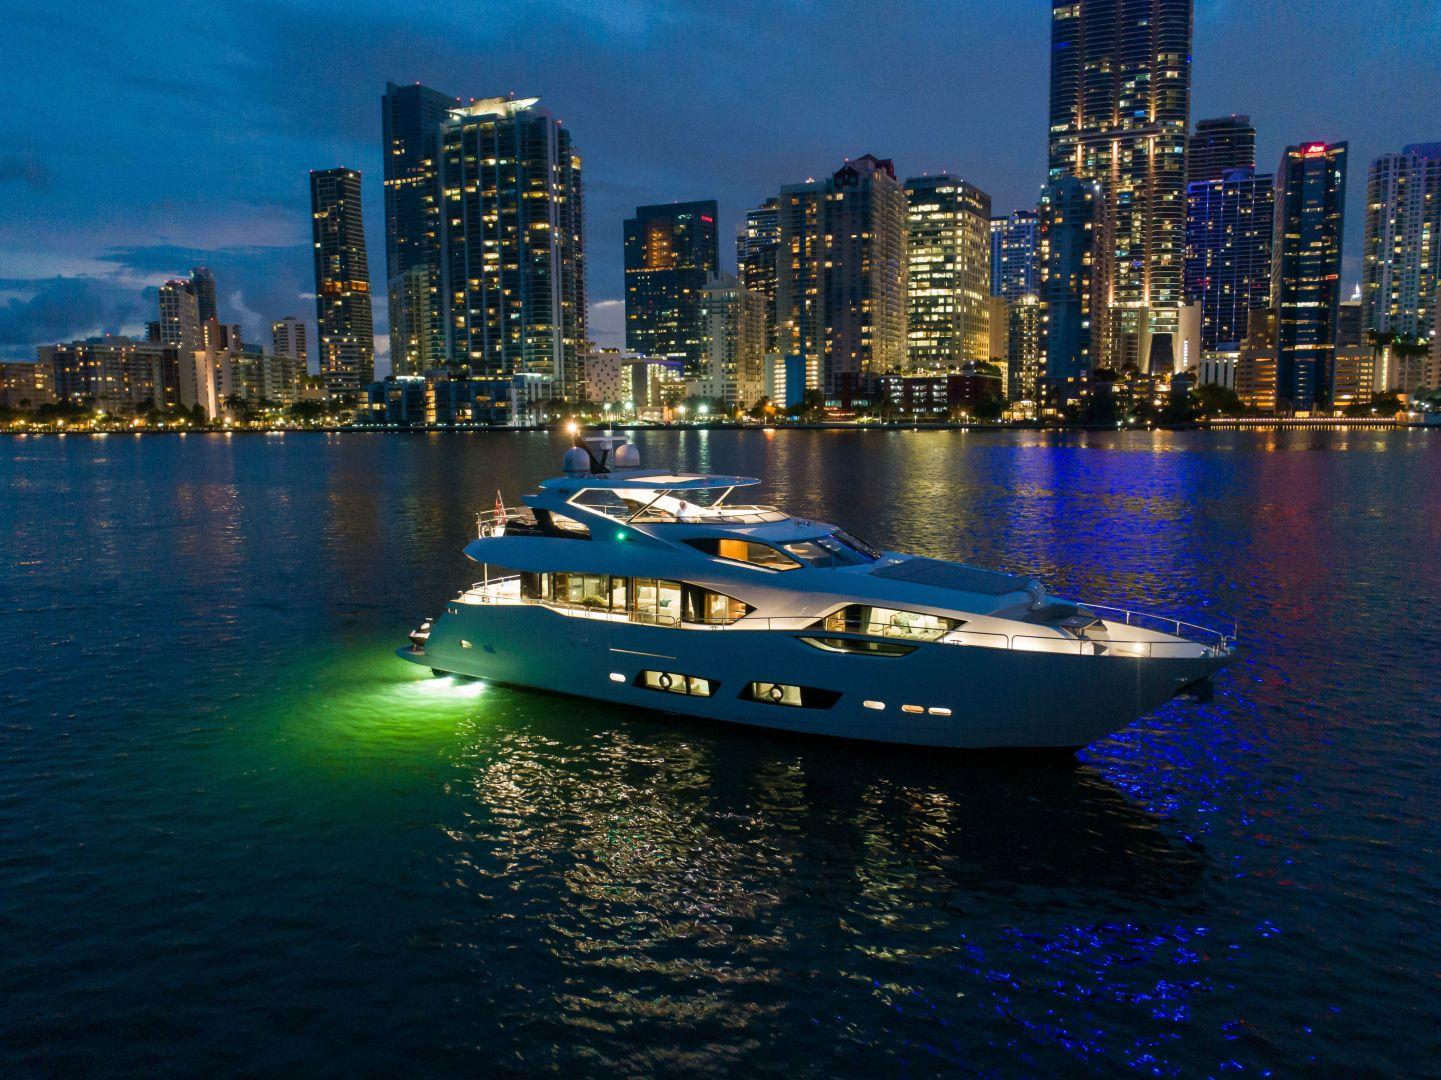 Sunseeker-95 Yacht 2017-Perseverance 3 Ft Lauderdale-Florida-United States-1400070   Thumbnail